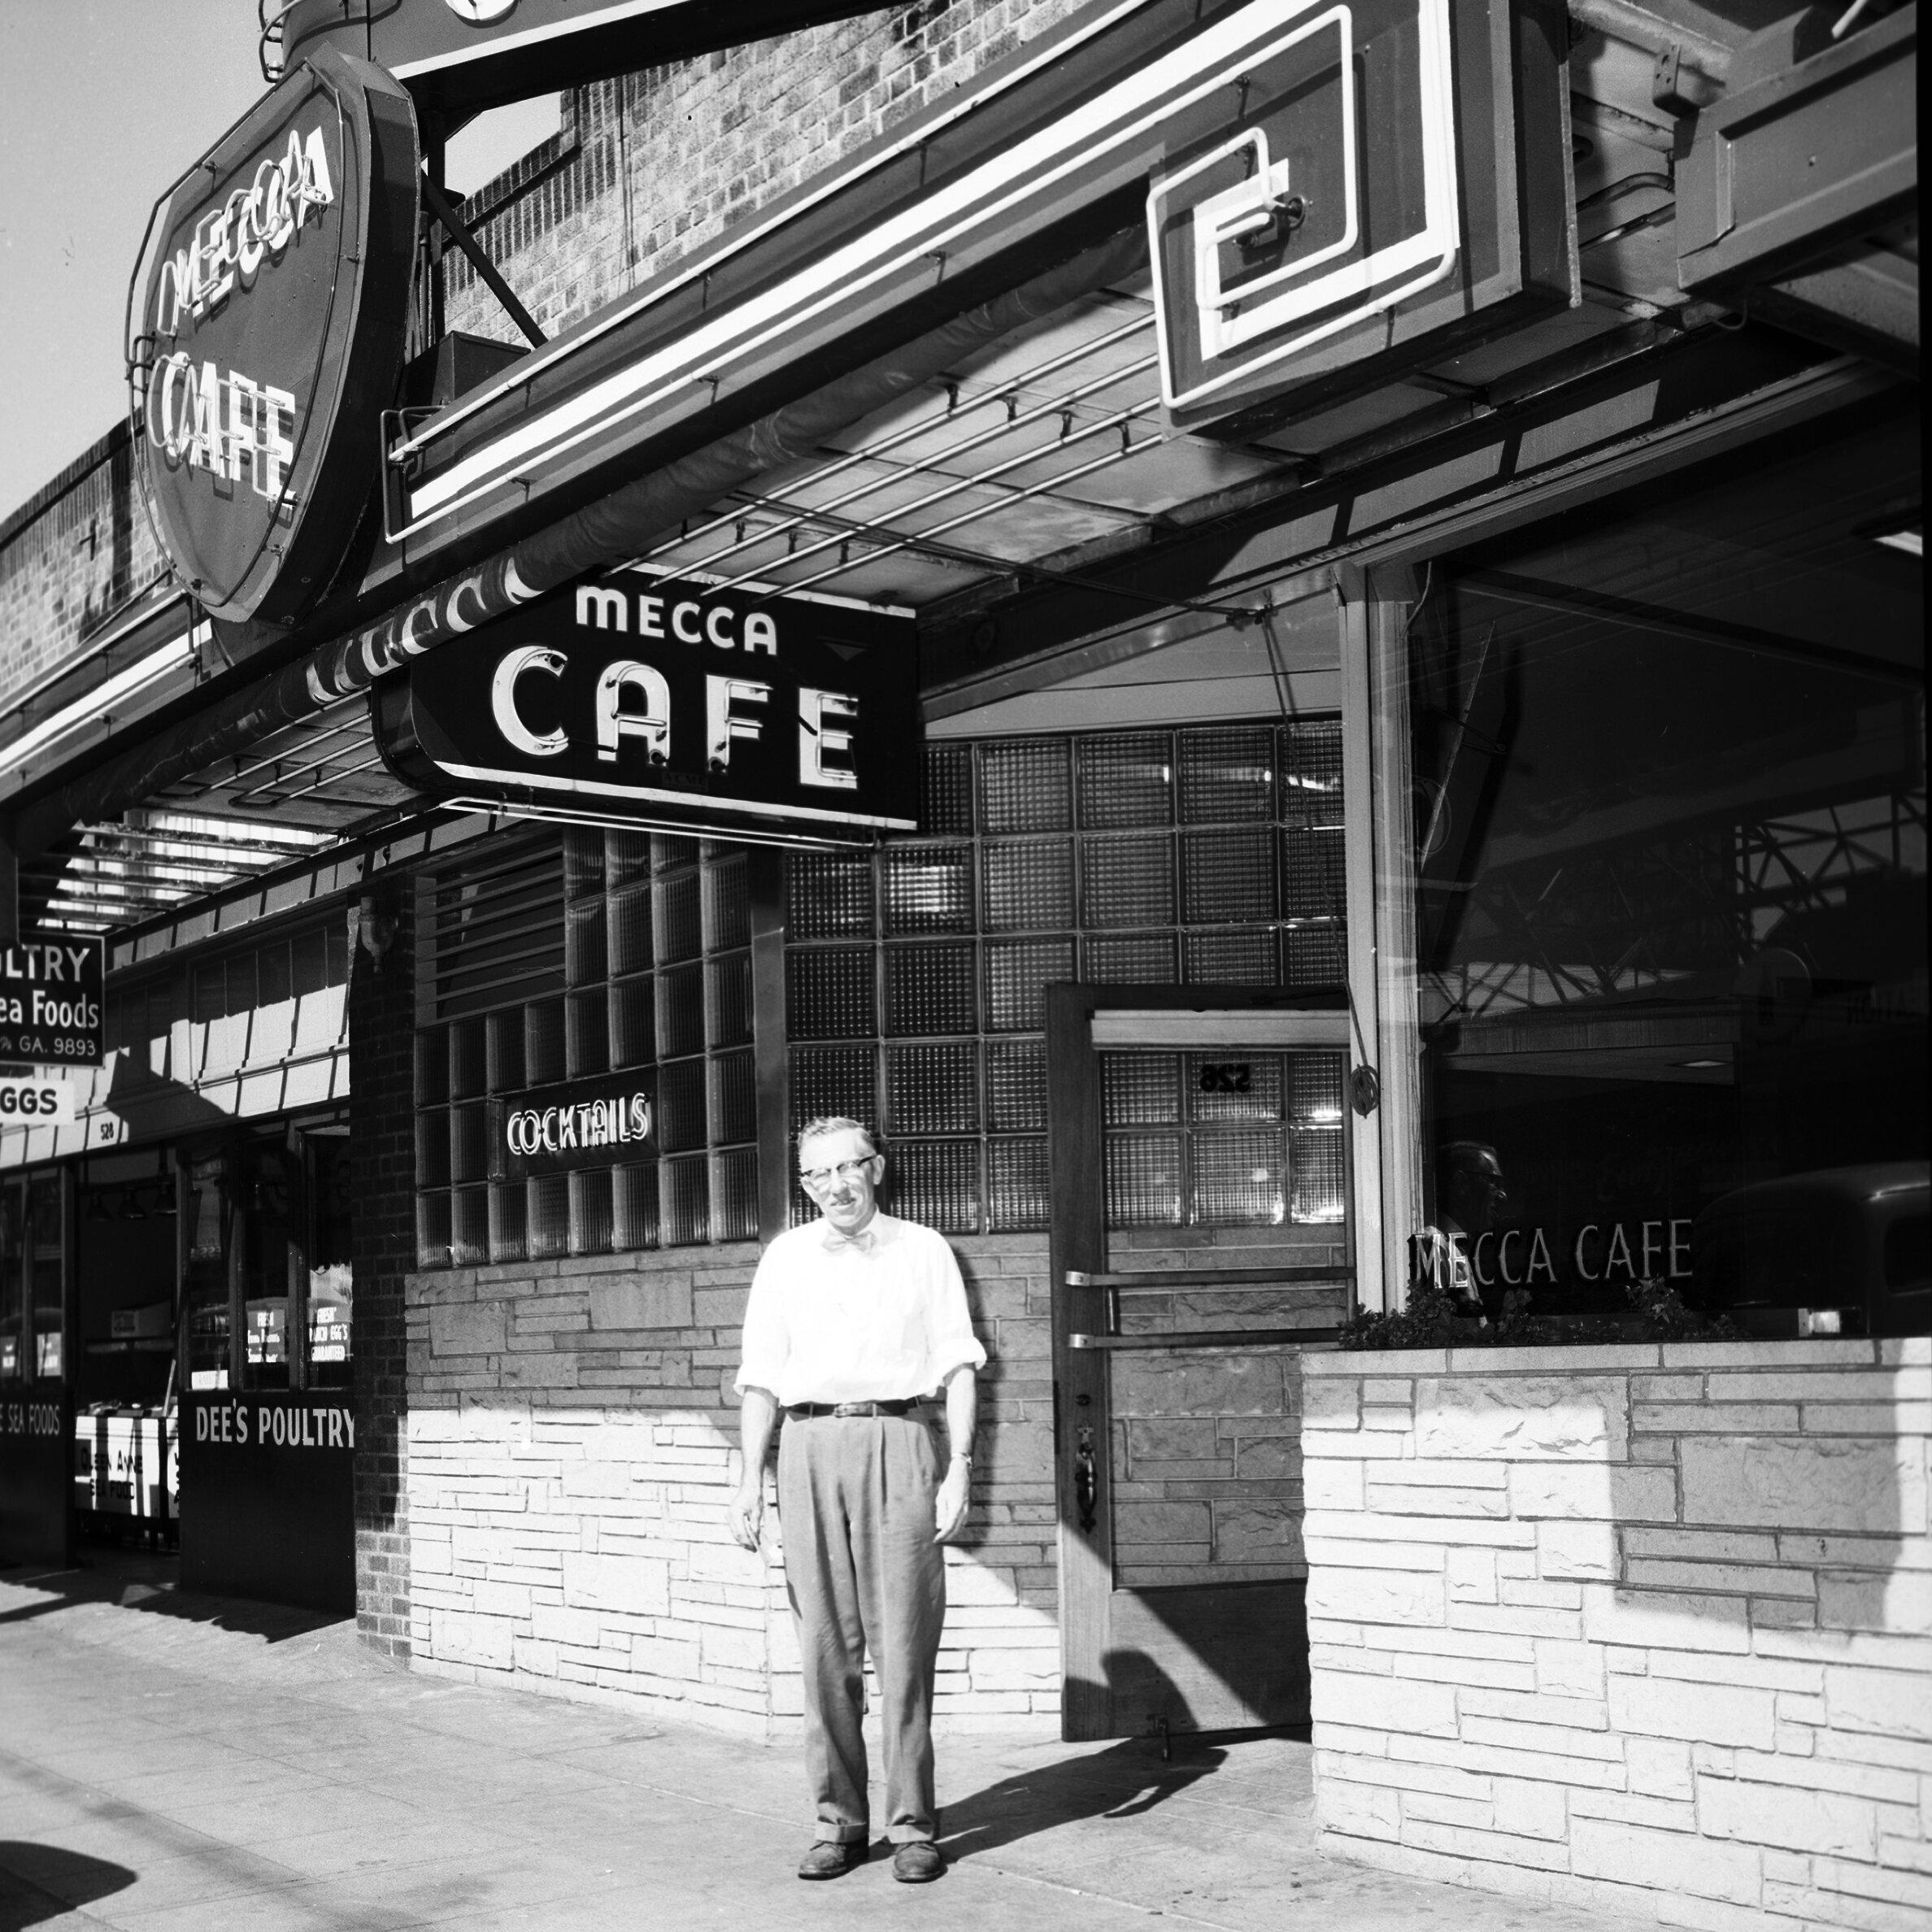 Mecca_Cafe,_Seattle,_1954.jpg